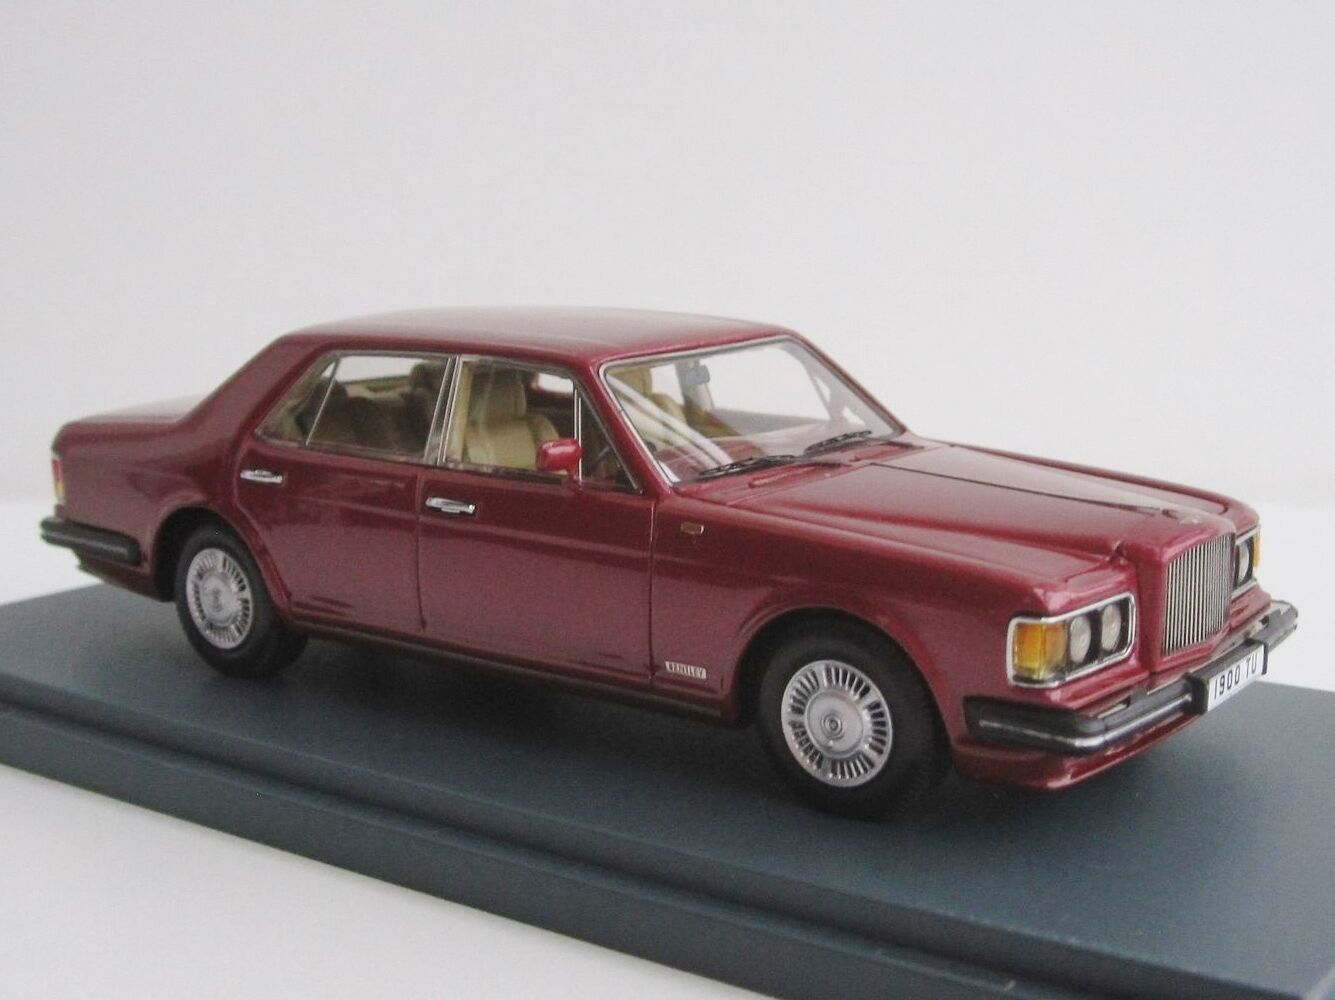 Bentley Mulsanne Turbo R 1 43 Neo Scale Models Neo 44165 Rt Eight